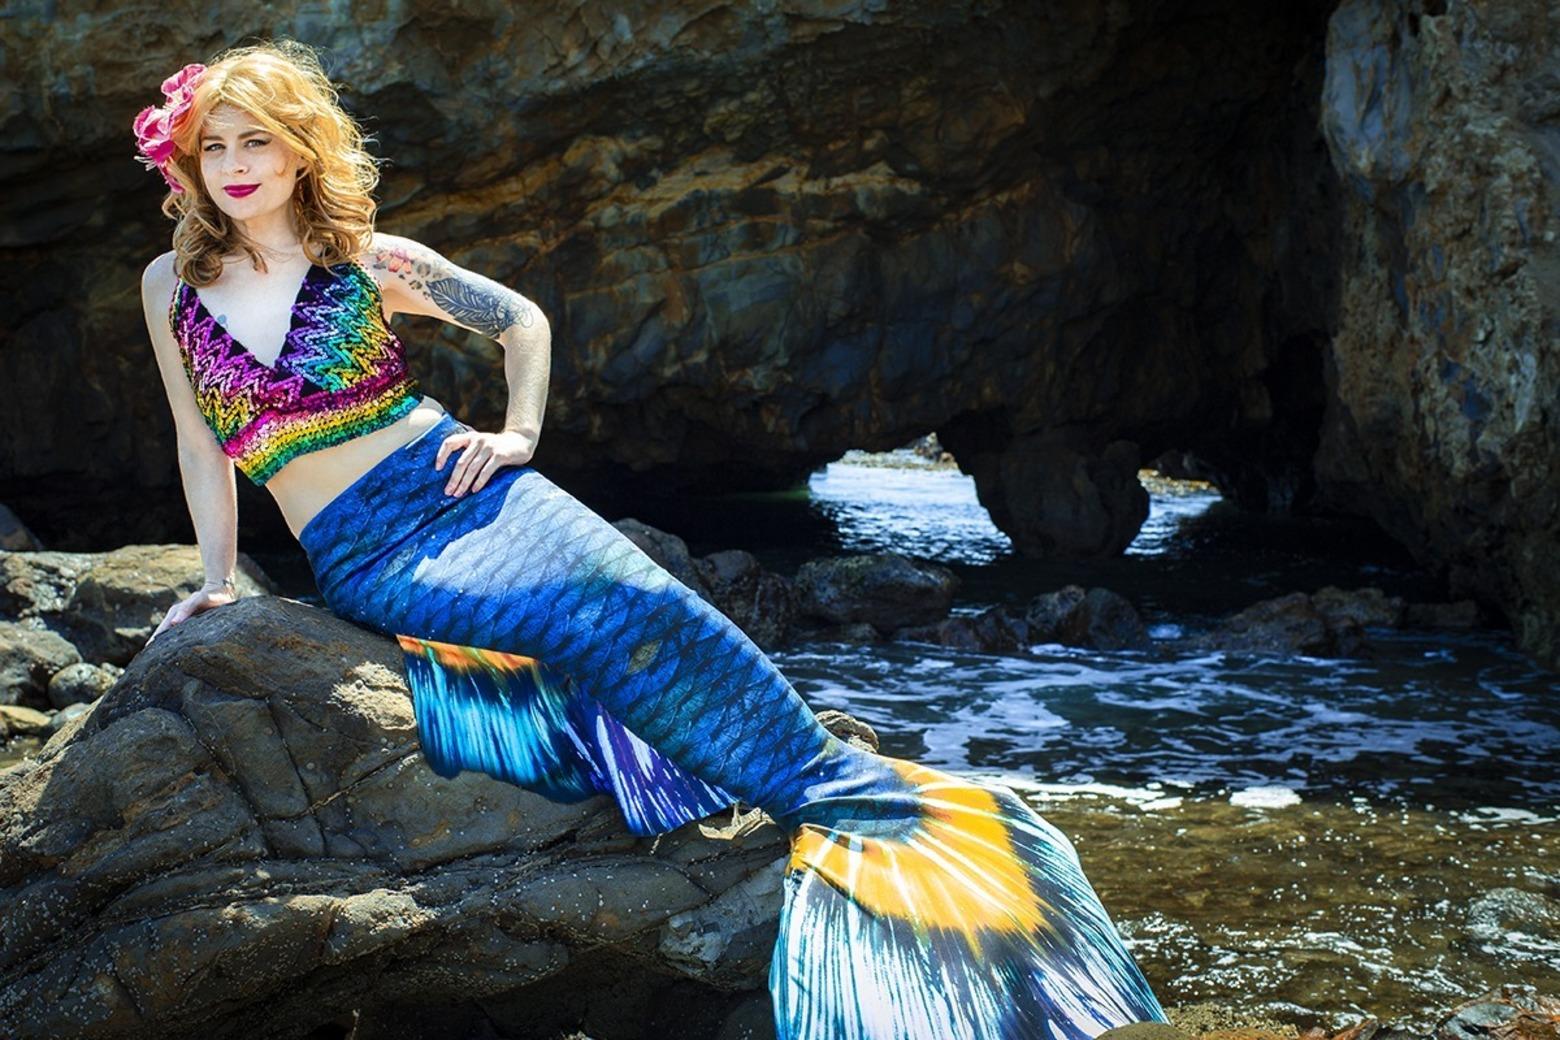 Mermaid Jinx sitting sideays on a rock in the Pacific Ocean